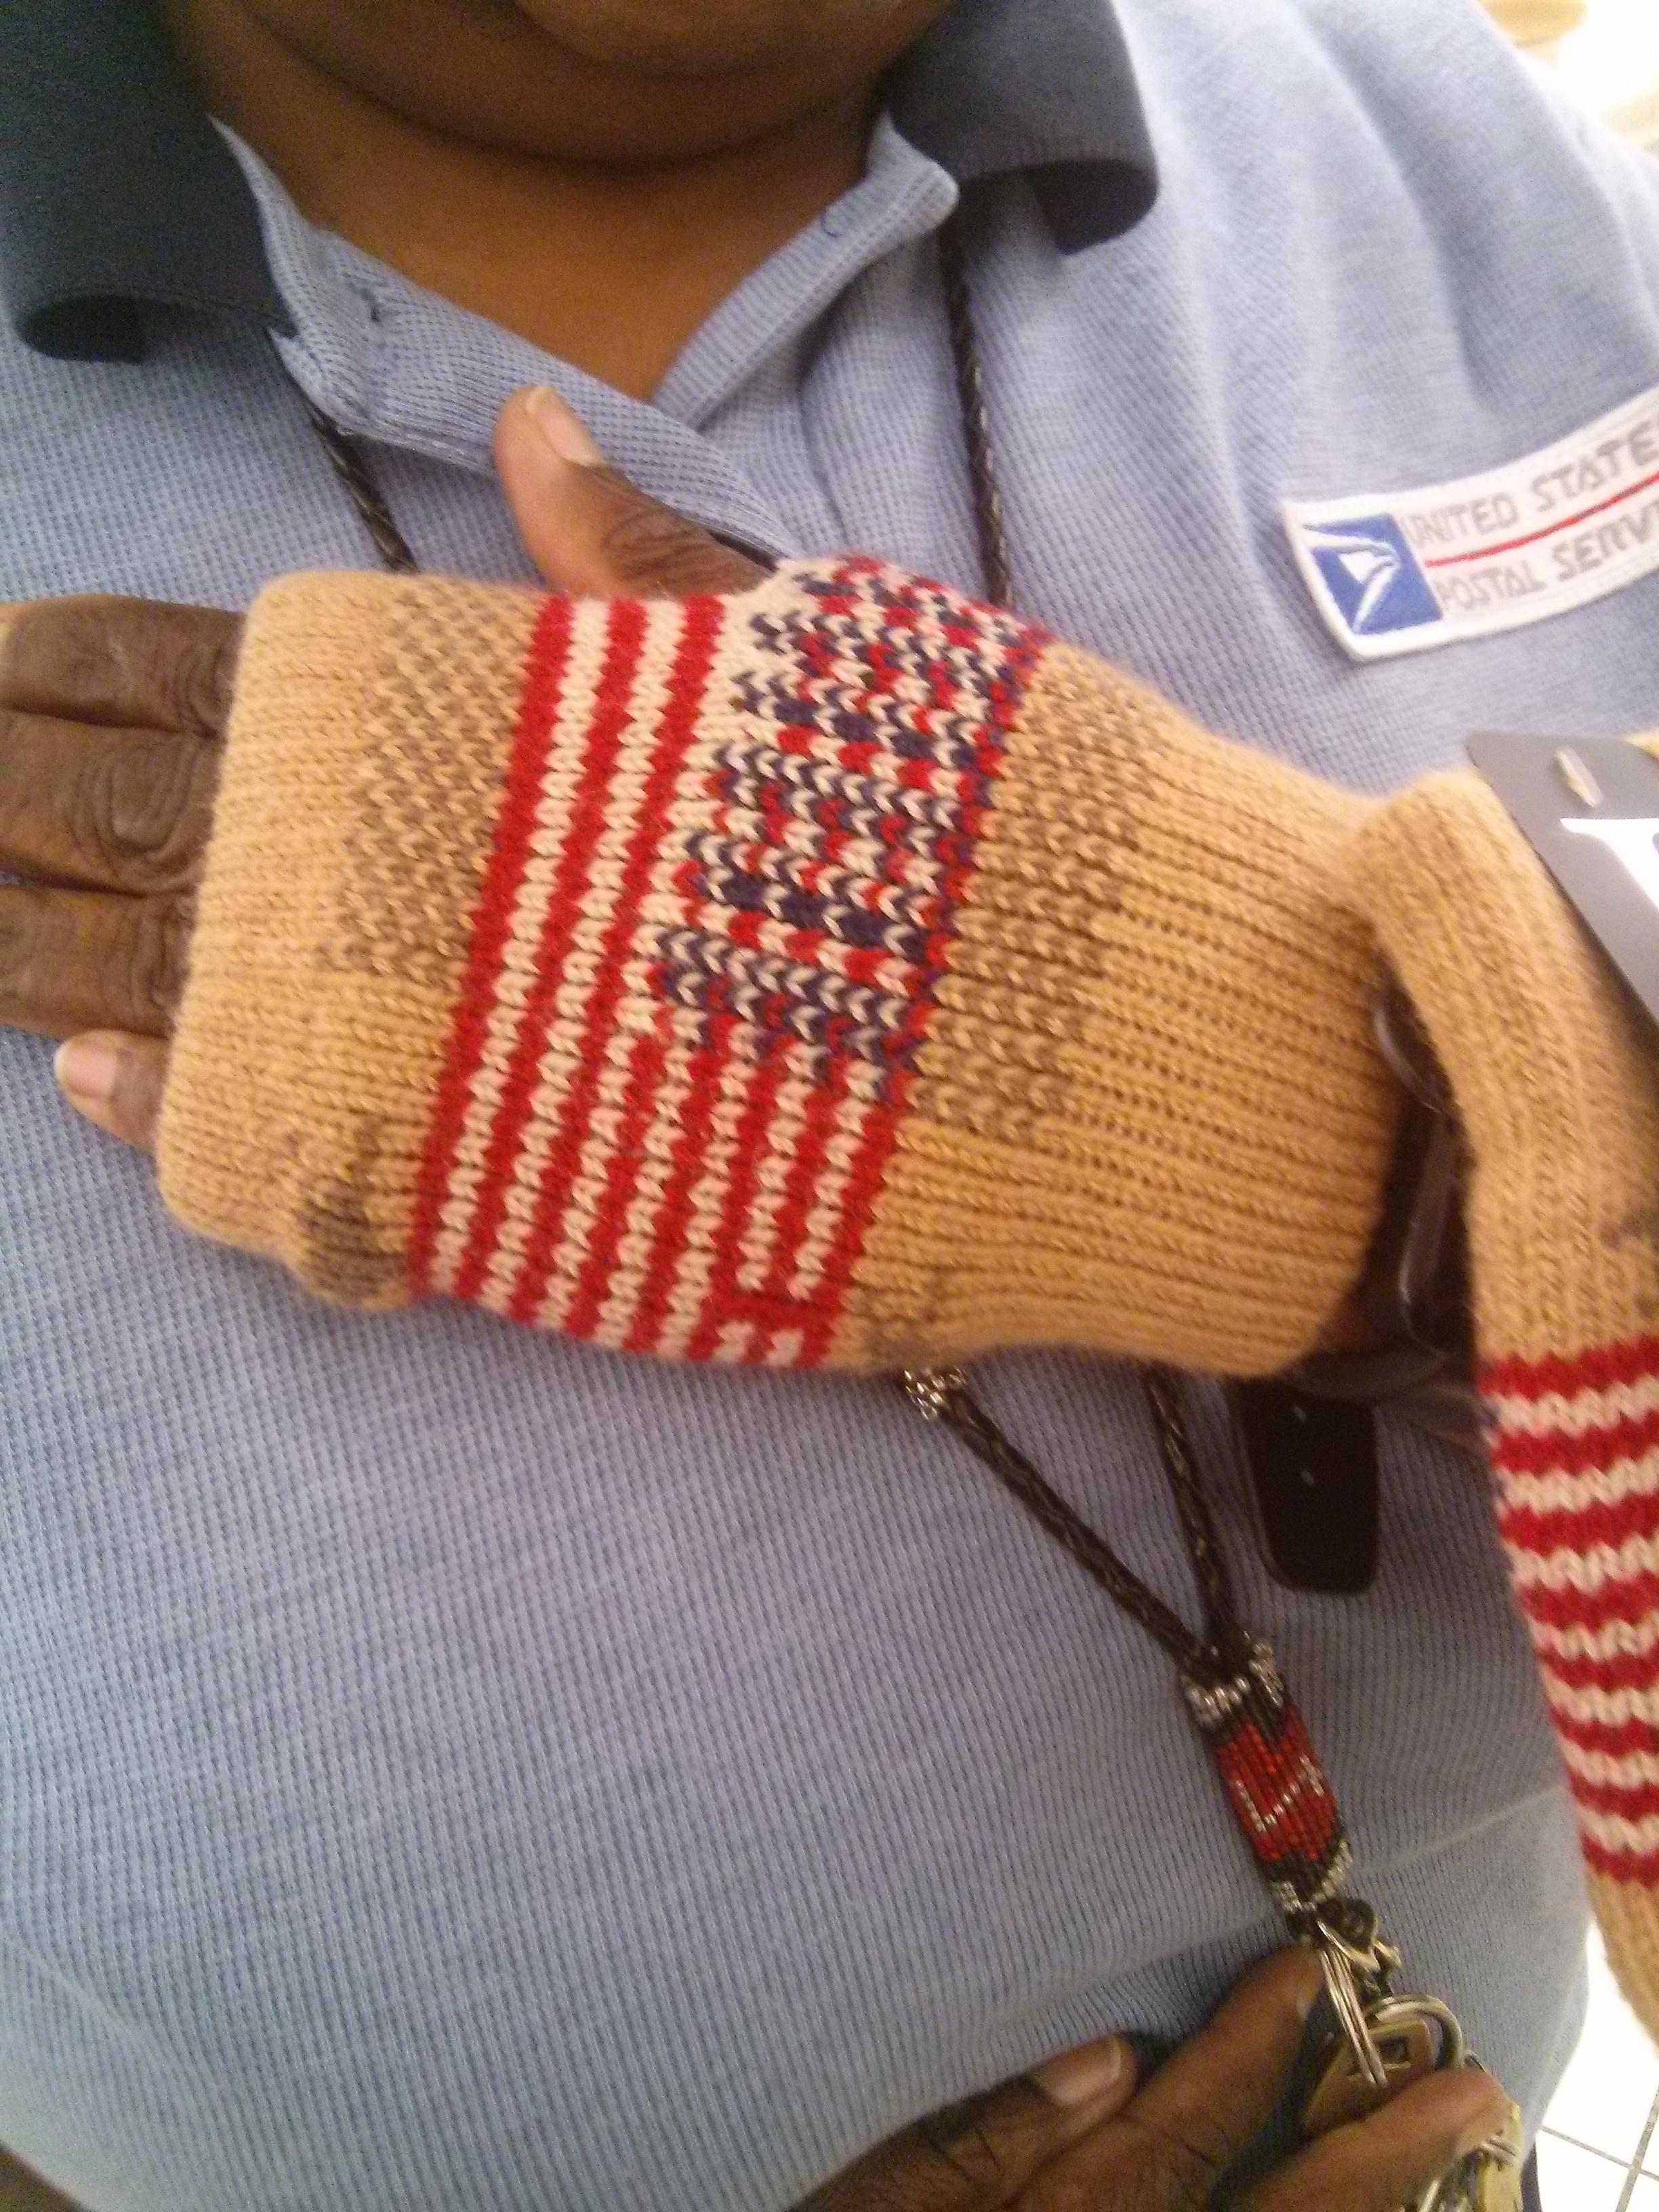 Customer tries on Fingerless Hand Warmer Gloves @ USDA